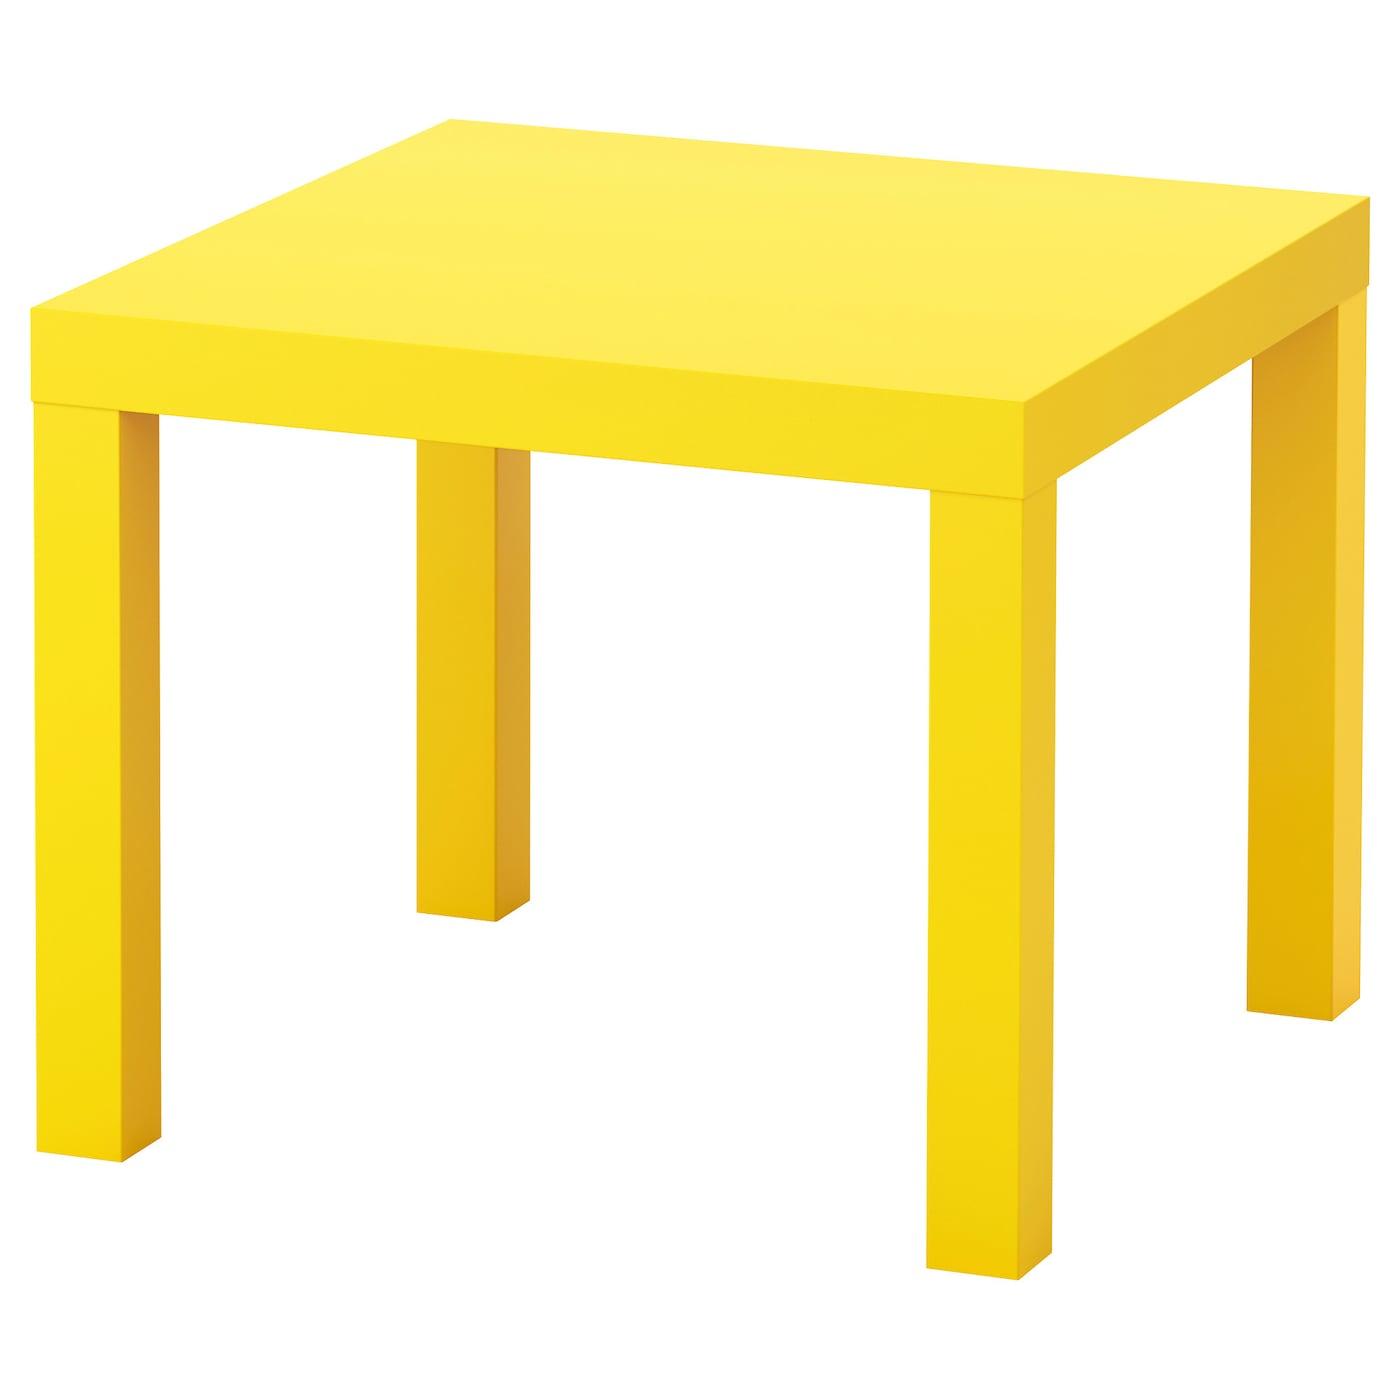 Lack tafeltje geel 55x55 cm ikea - Mesa dibujo ikea ...